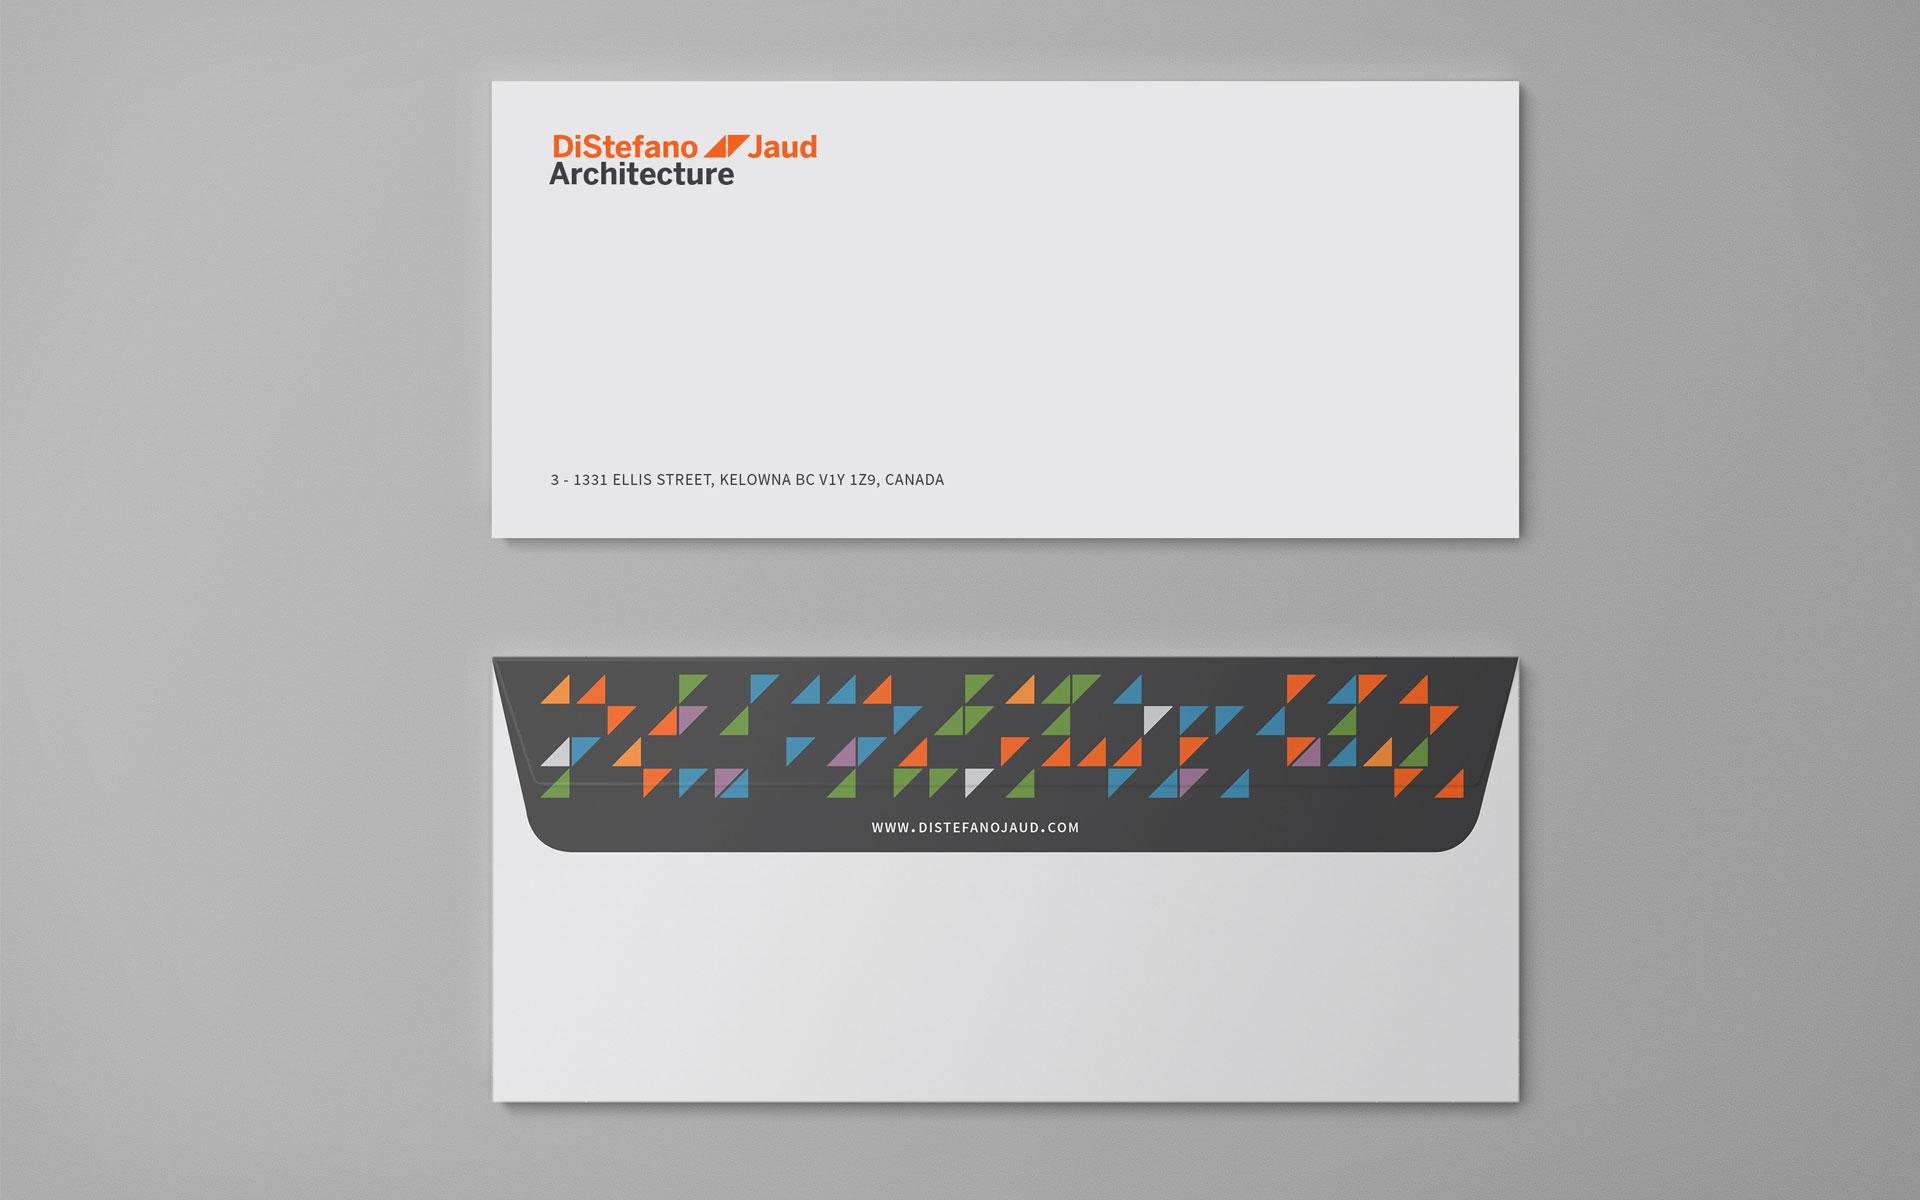 distefano-jaud-architcture-envelope